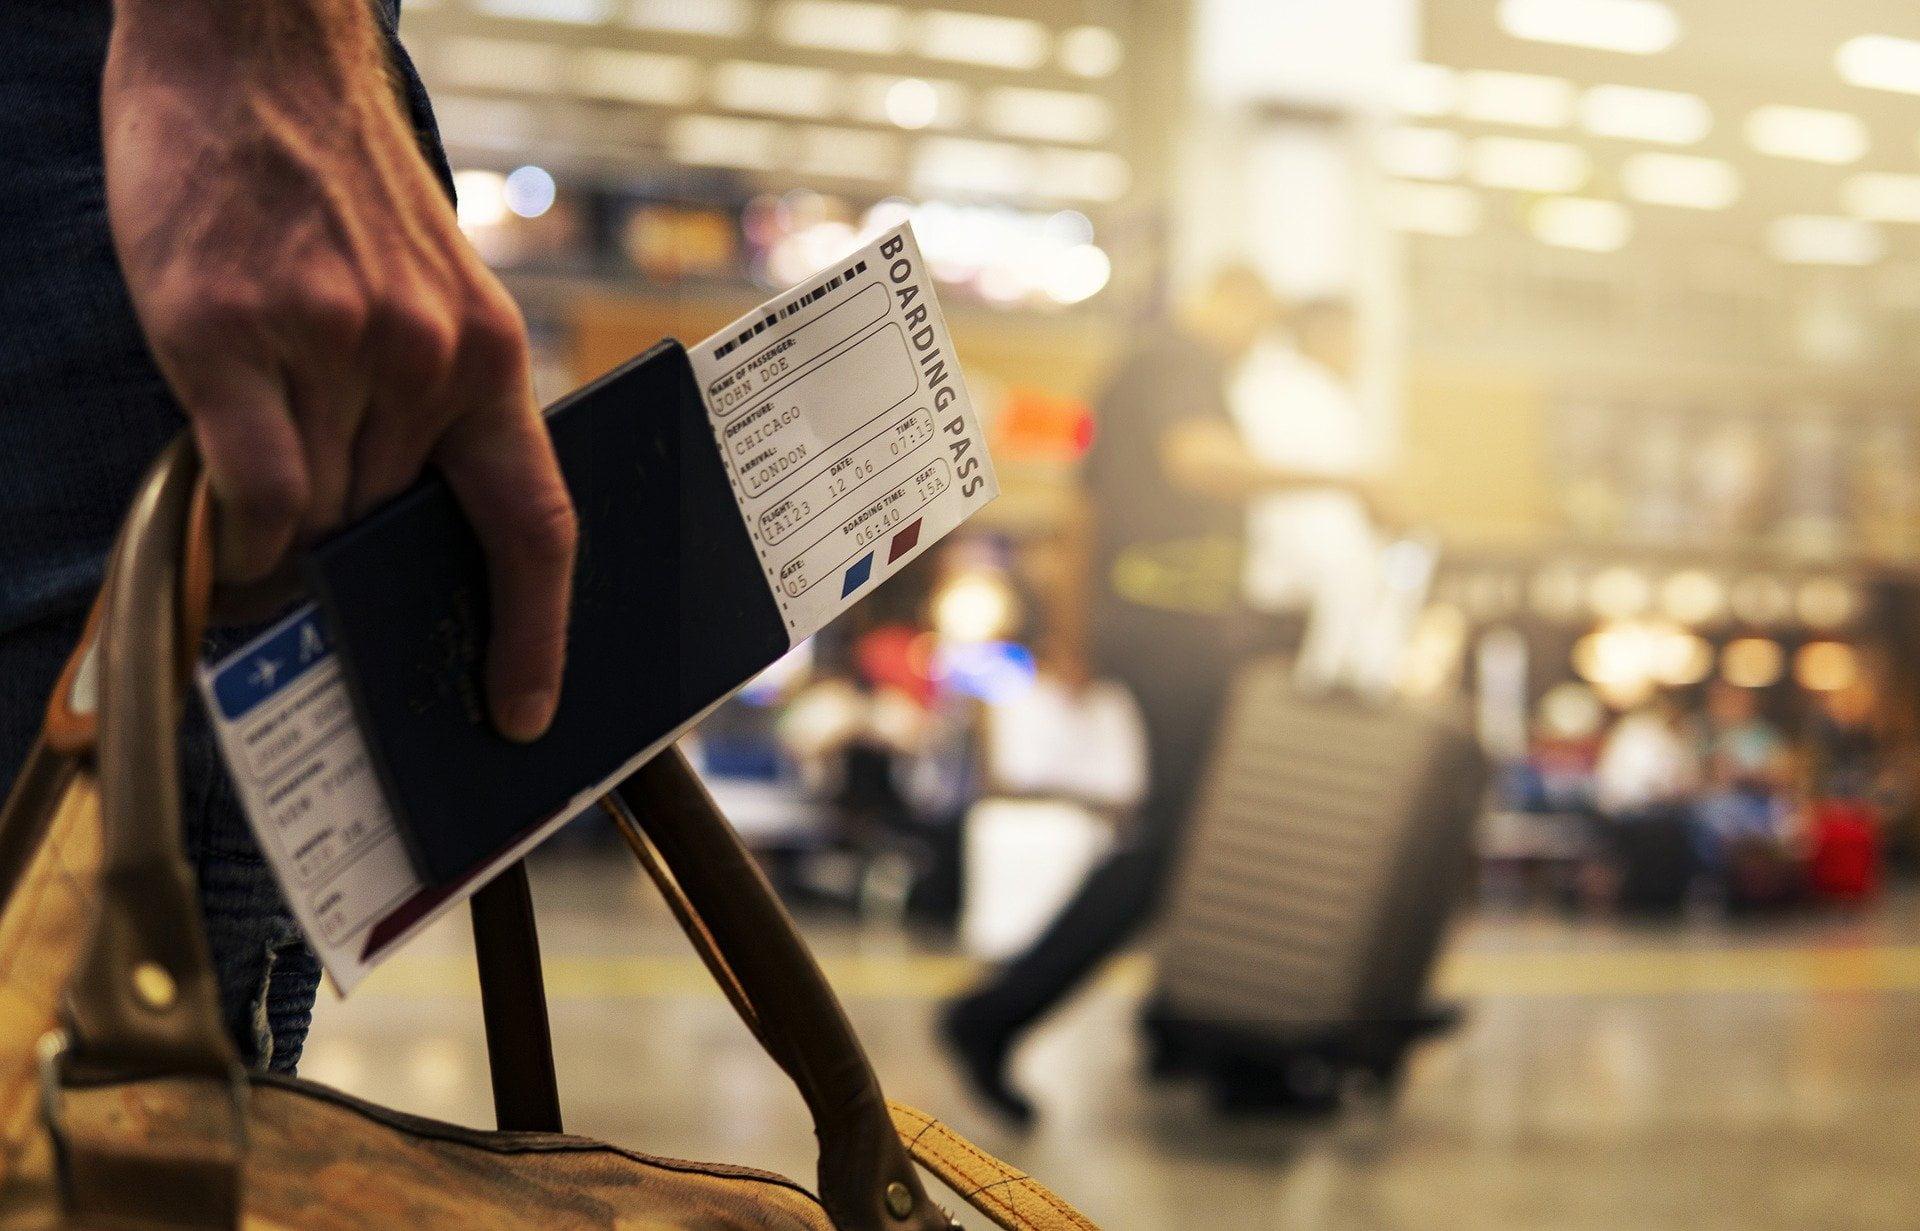 Pasaporte, viajes, vuelos